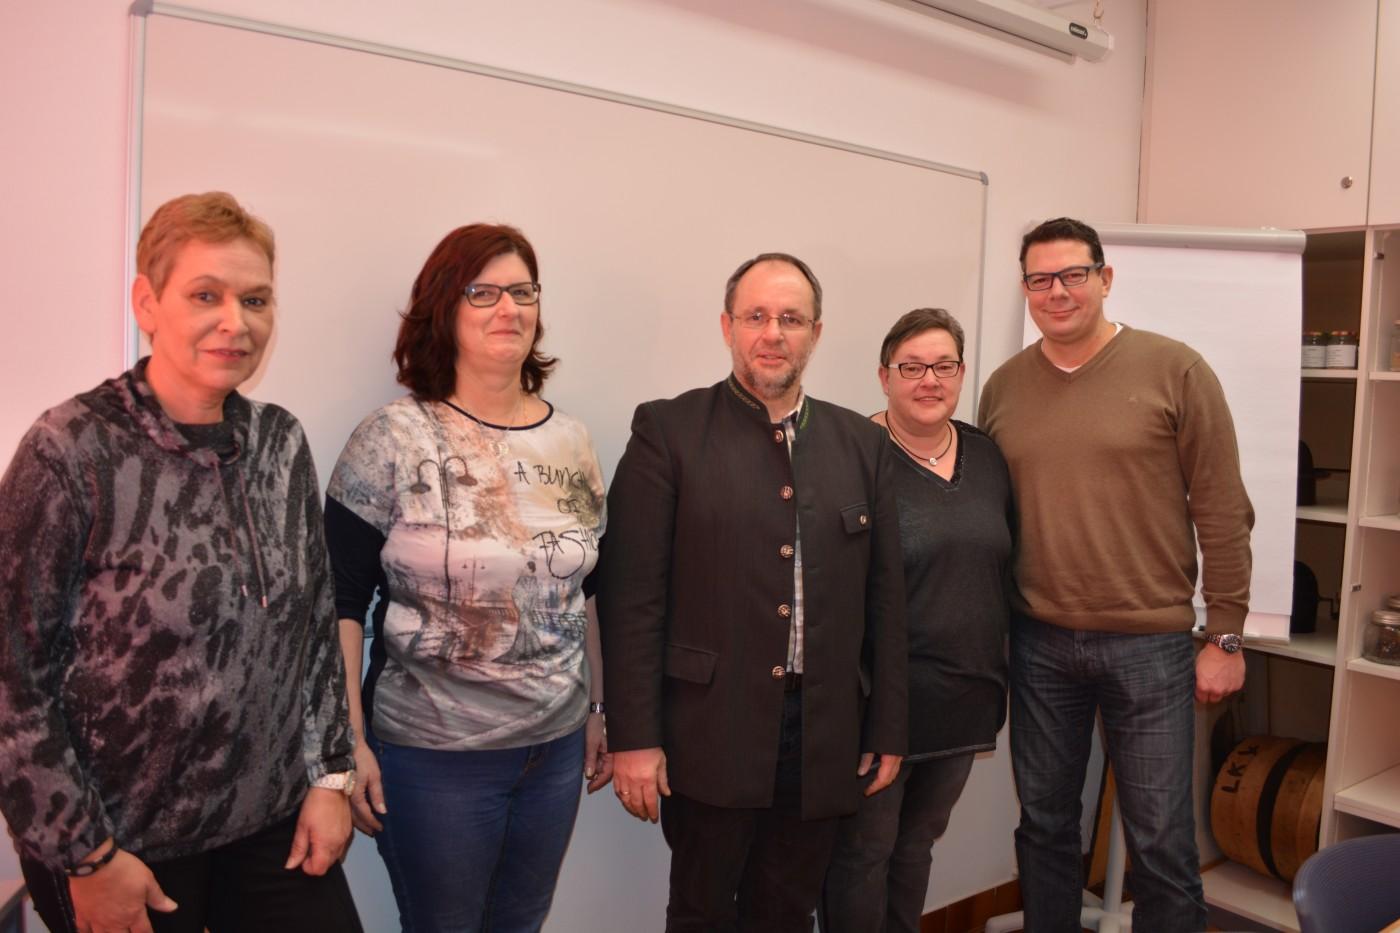 von links nach rechts: Frau Souba Manuela, Frau Gutmann Renate, Herr Heschl Richard, Frau Pickl Anita, Herr Wolf Gerald